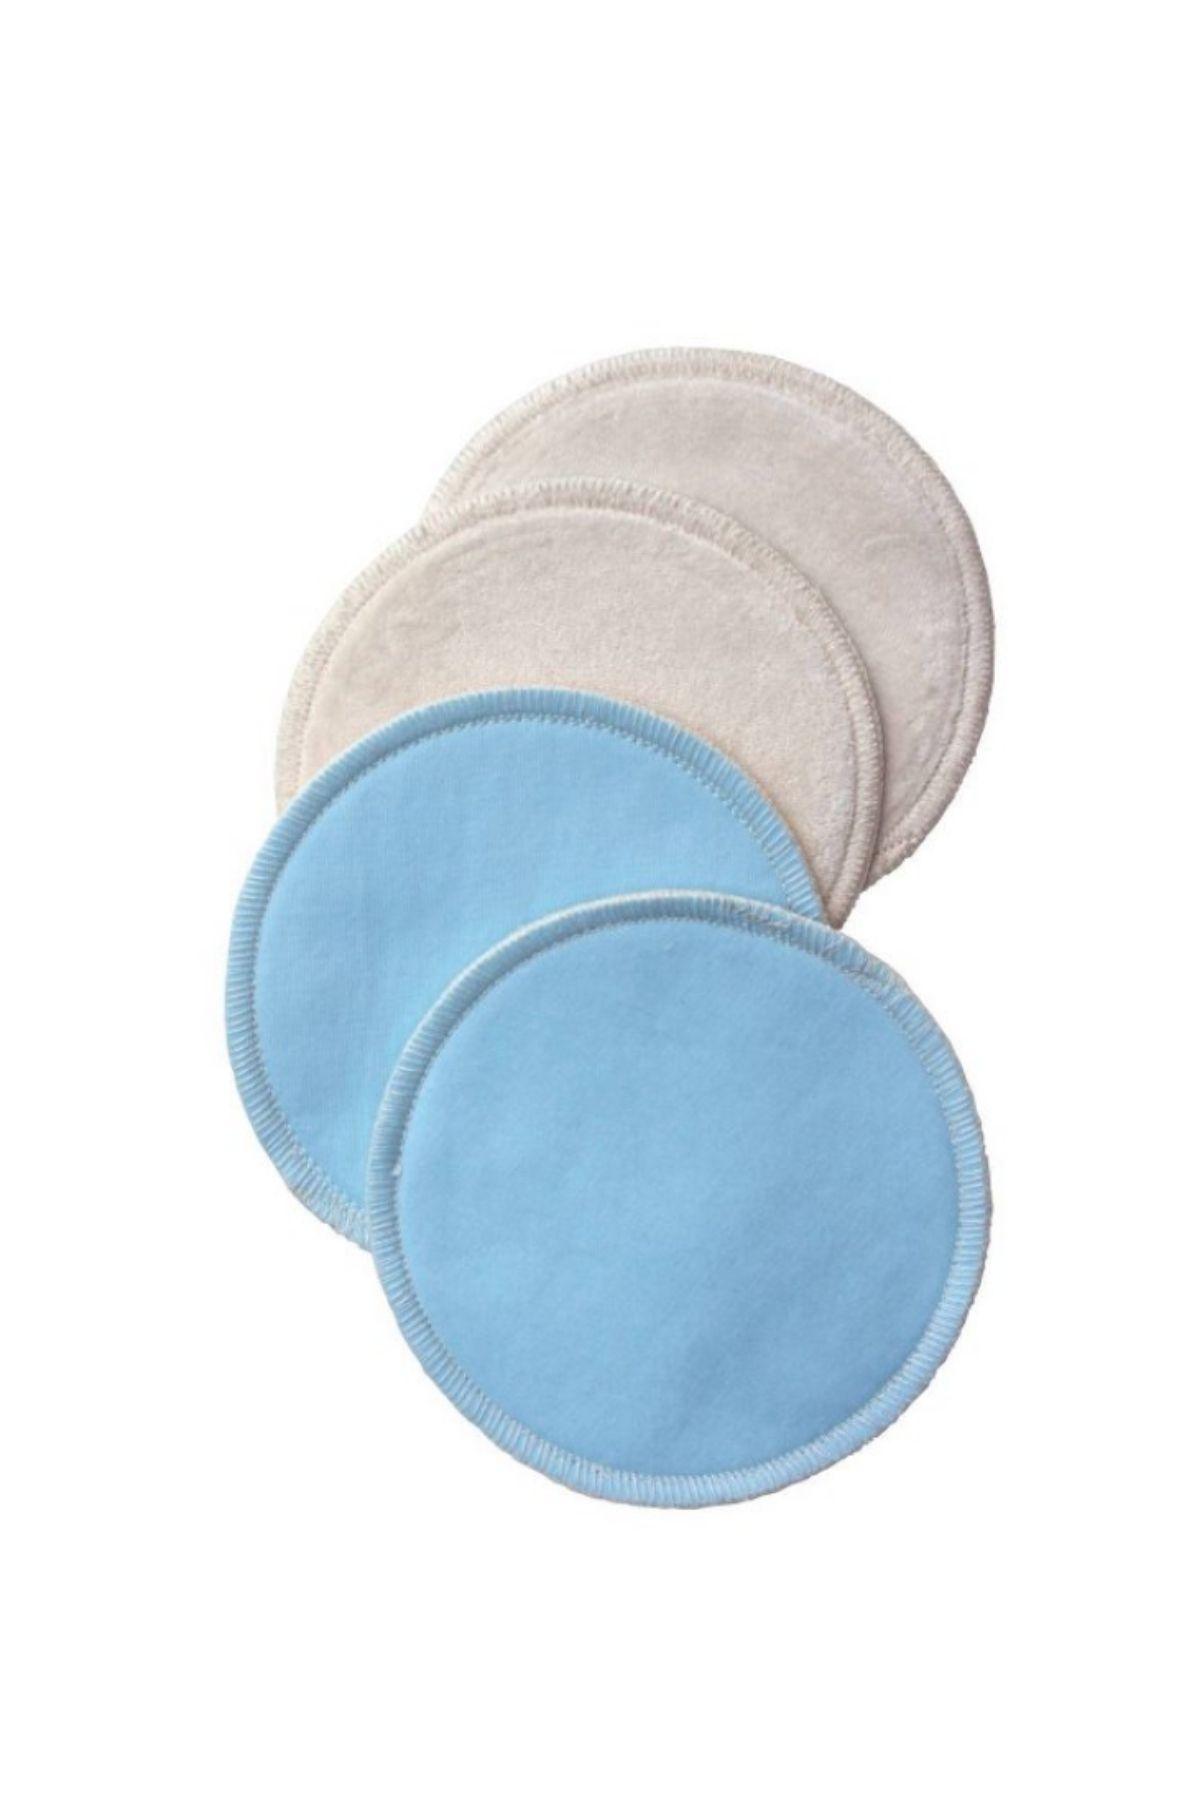 Nursing pads on white background.